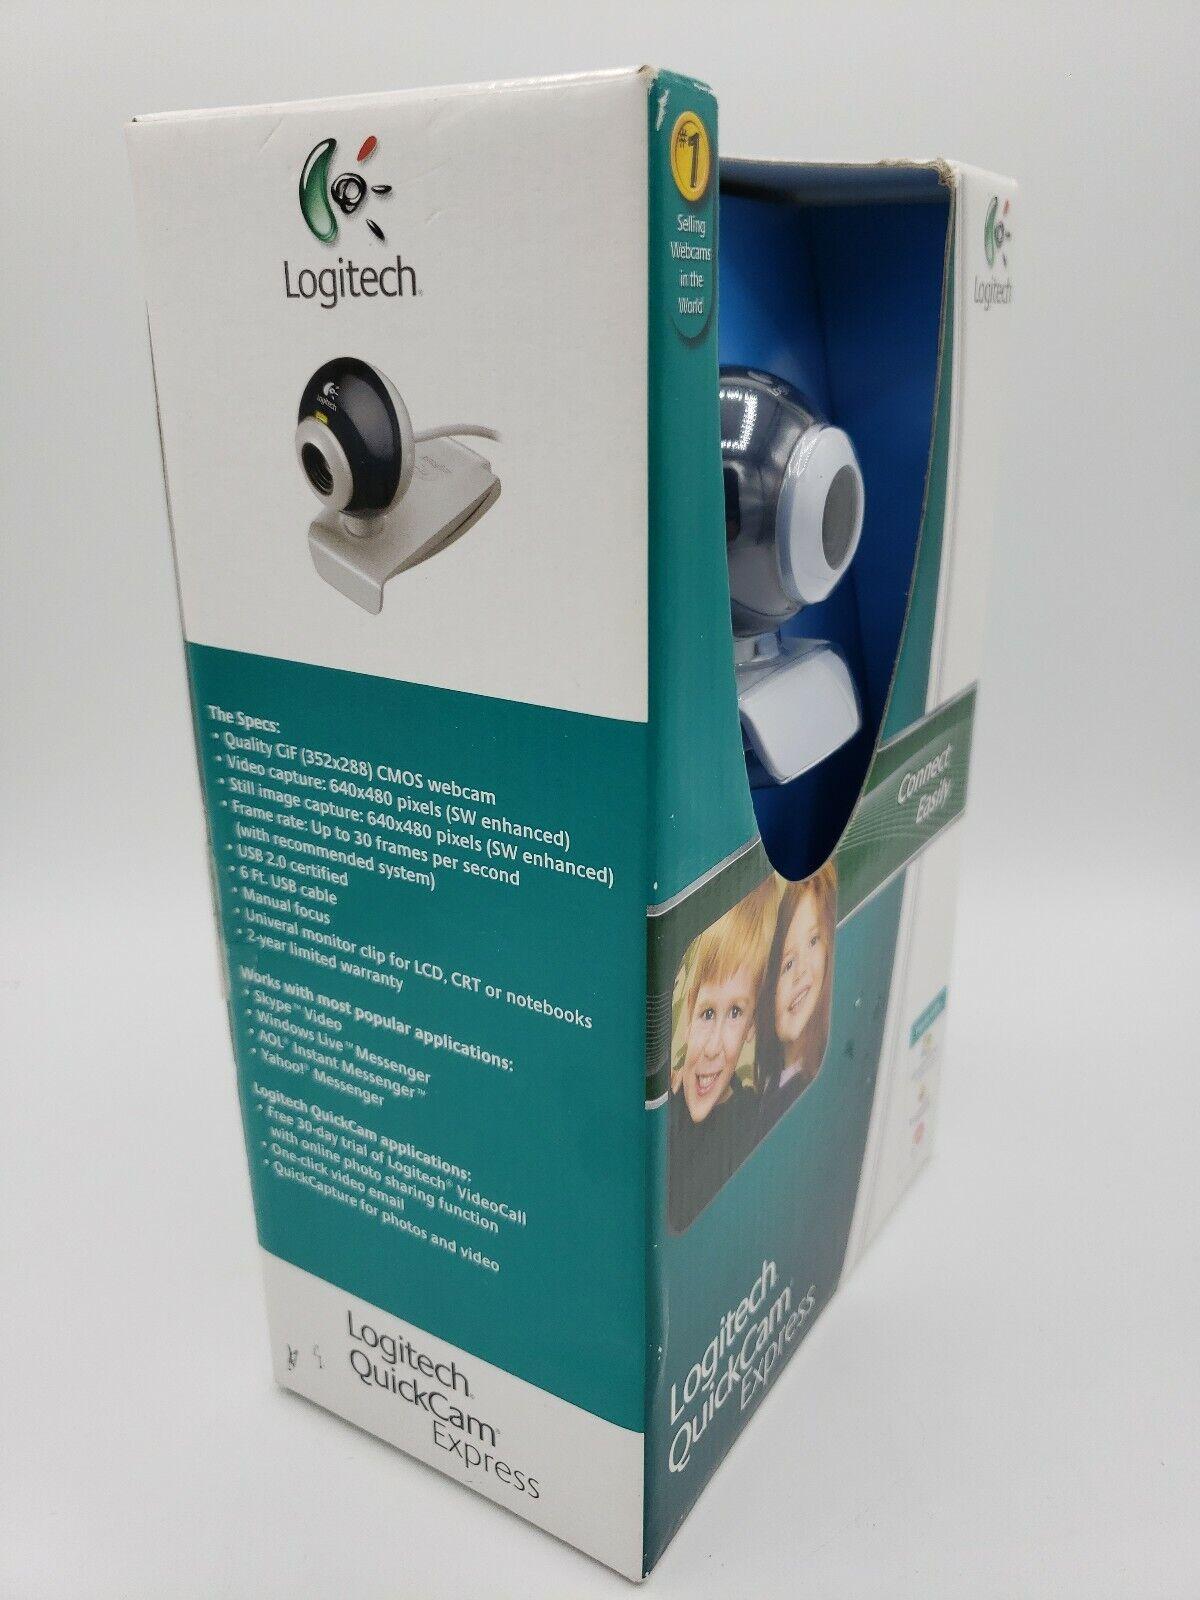 Logitech Quickcam Express Web Cam Video Capture 640x480 Pixels New